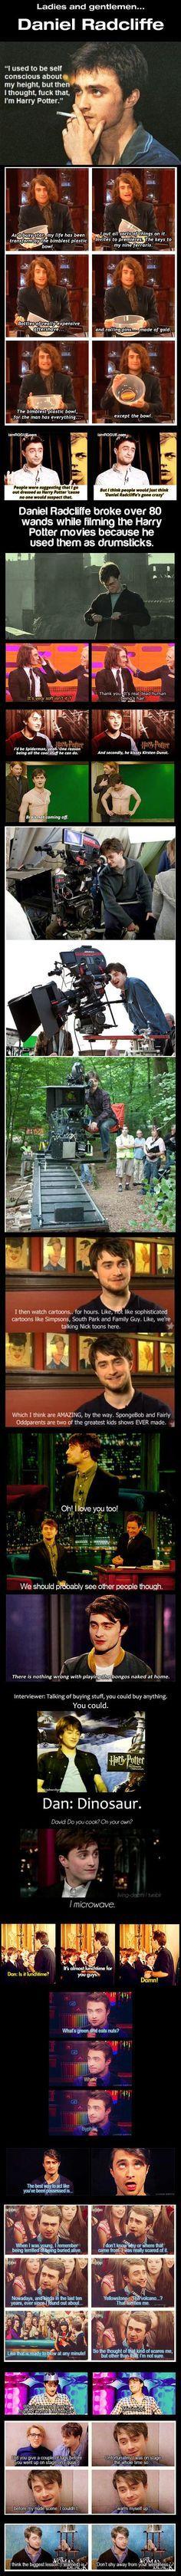 Daniel Radcliffe is like the male version of Jennifer Lawrence.